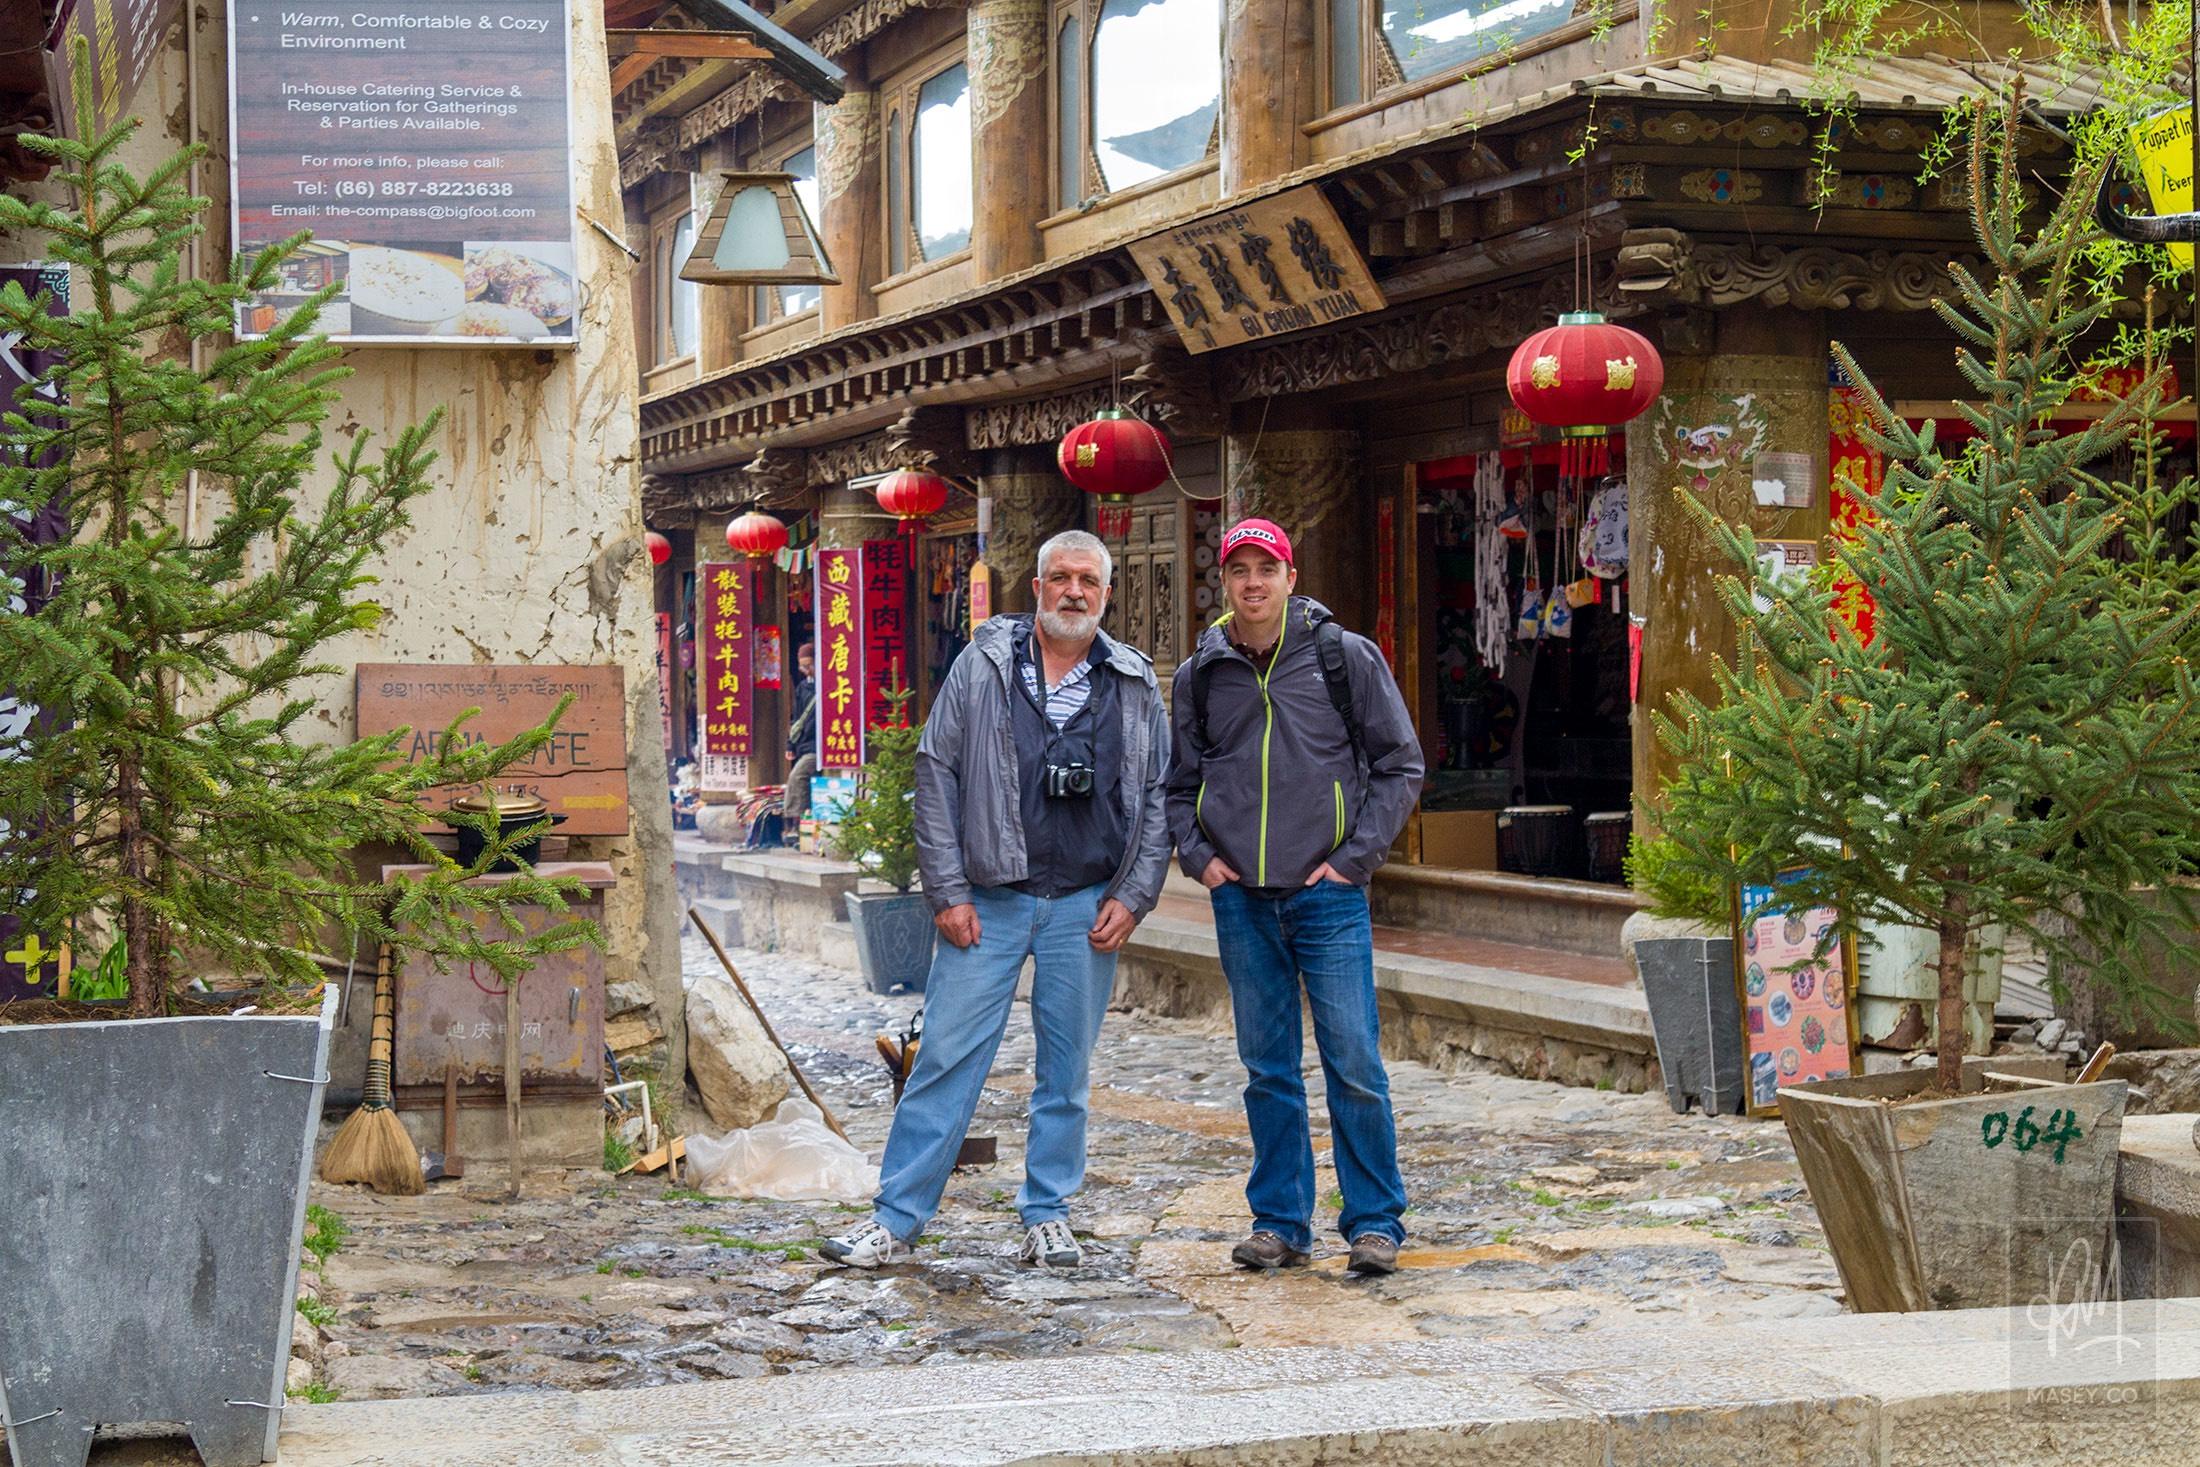 Shangri-La Old Town